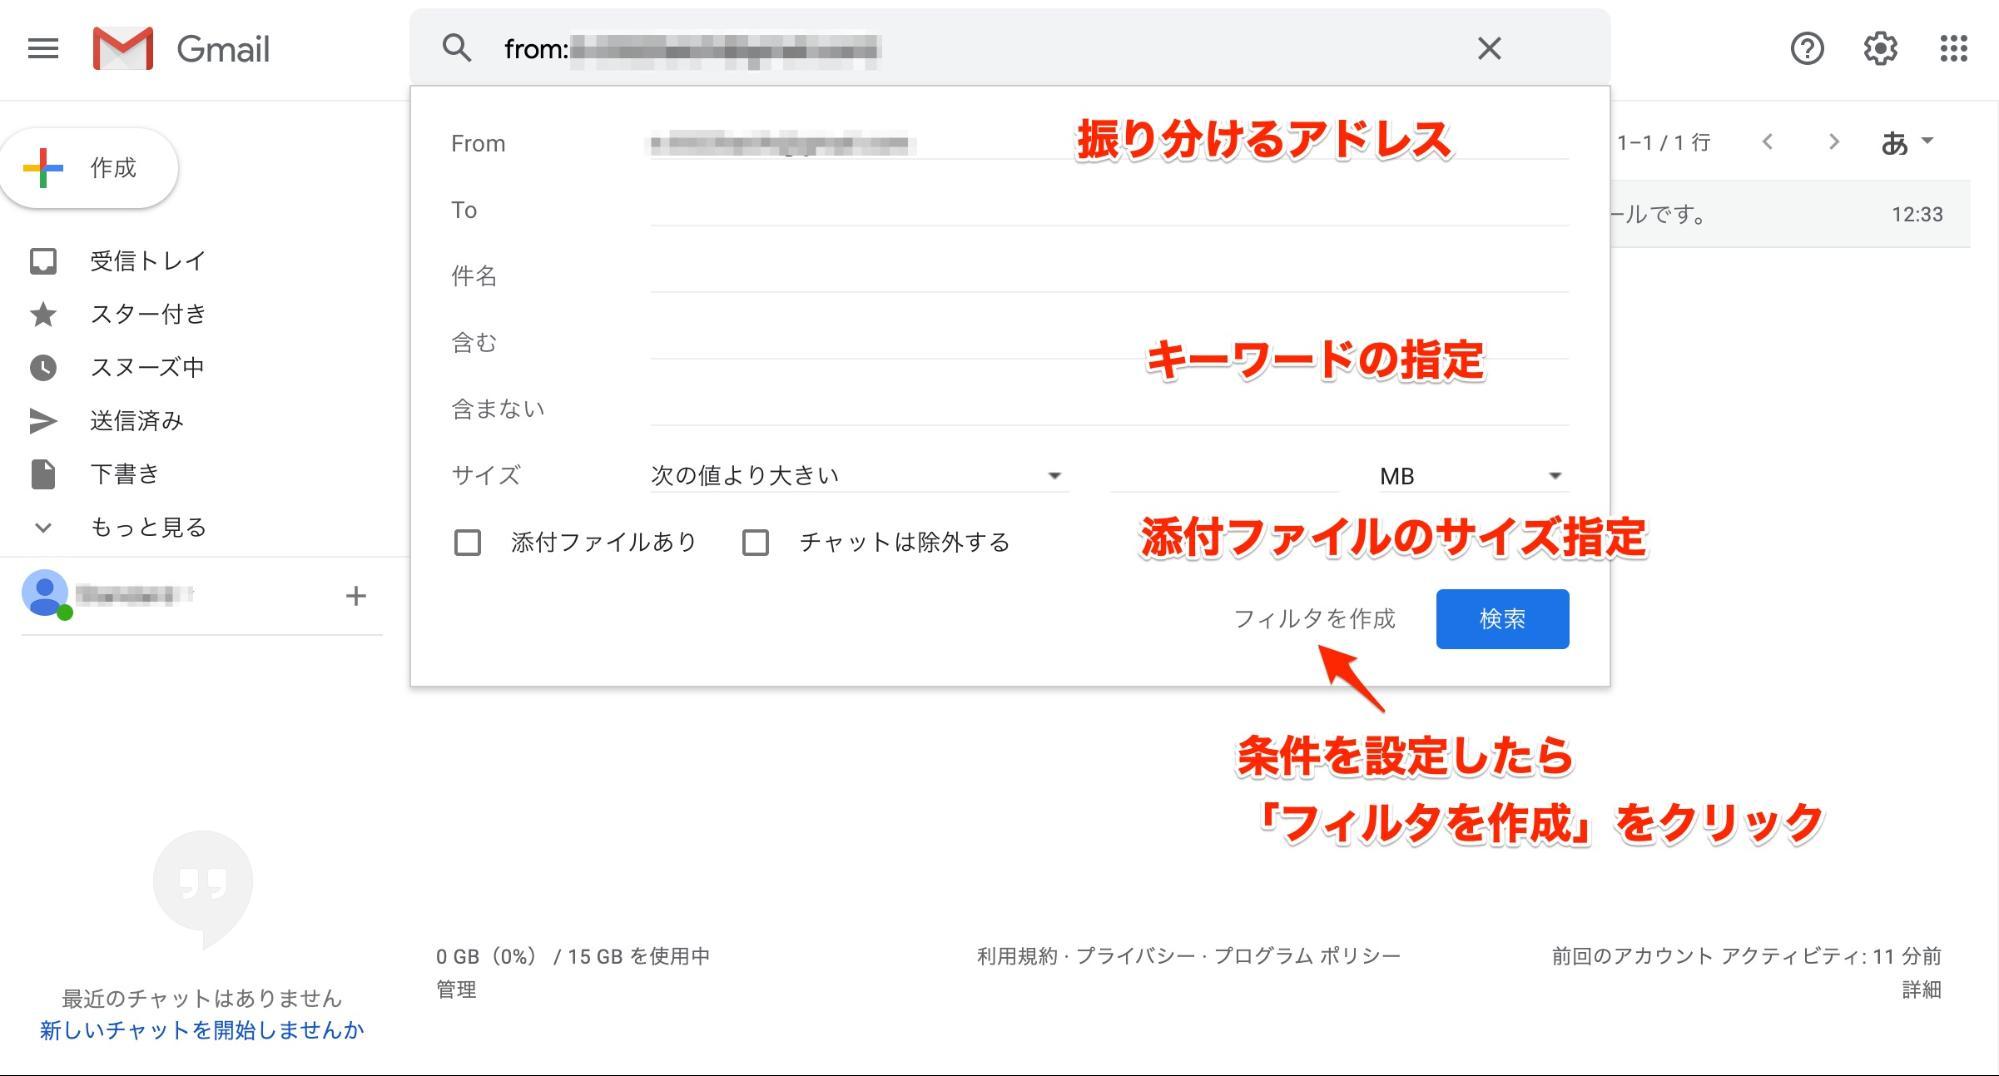 Gmail 自動 振り分け 設定